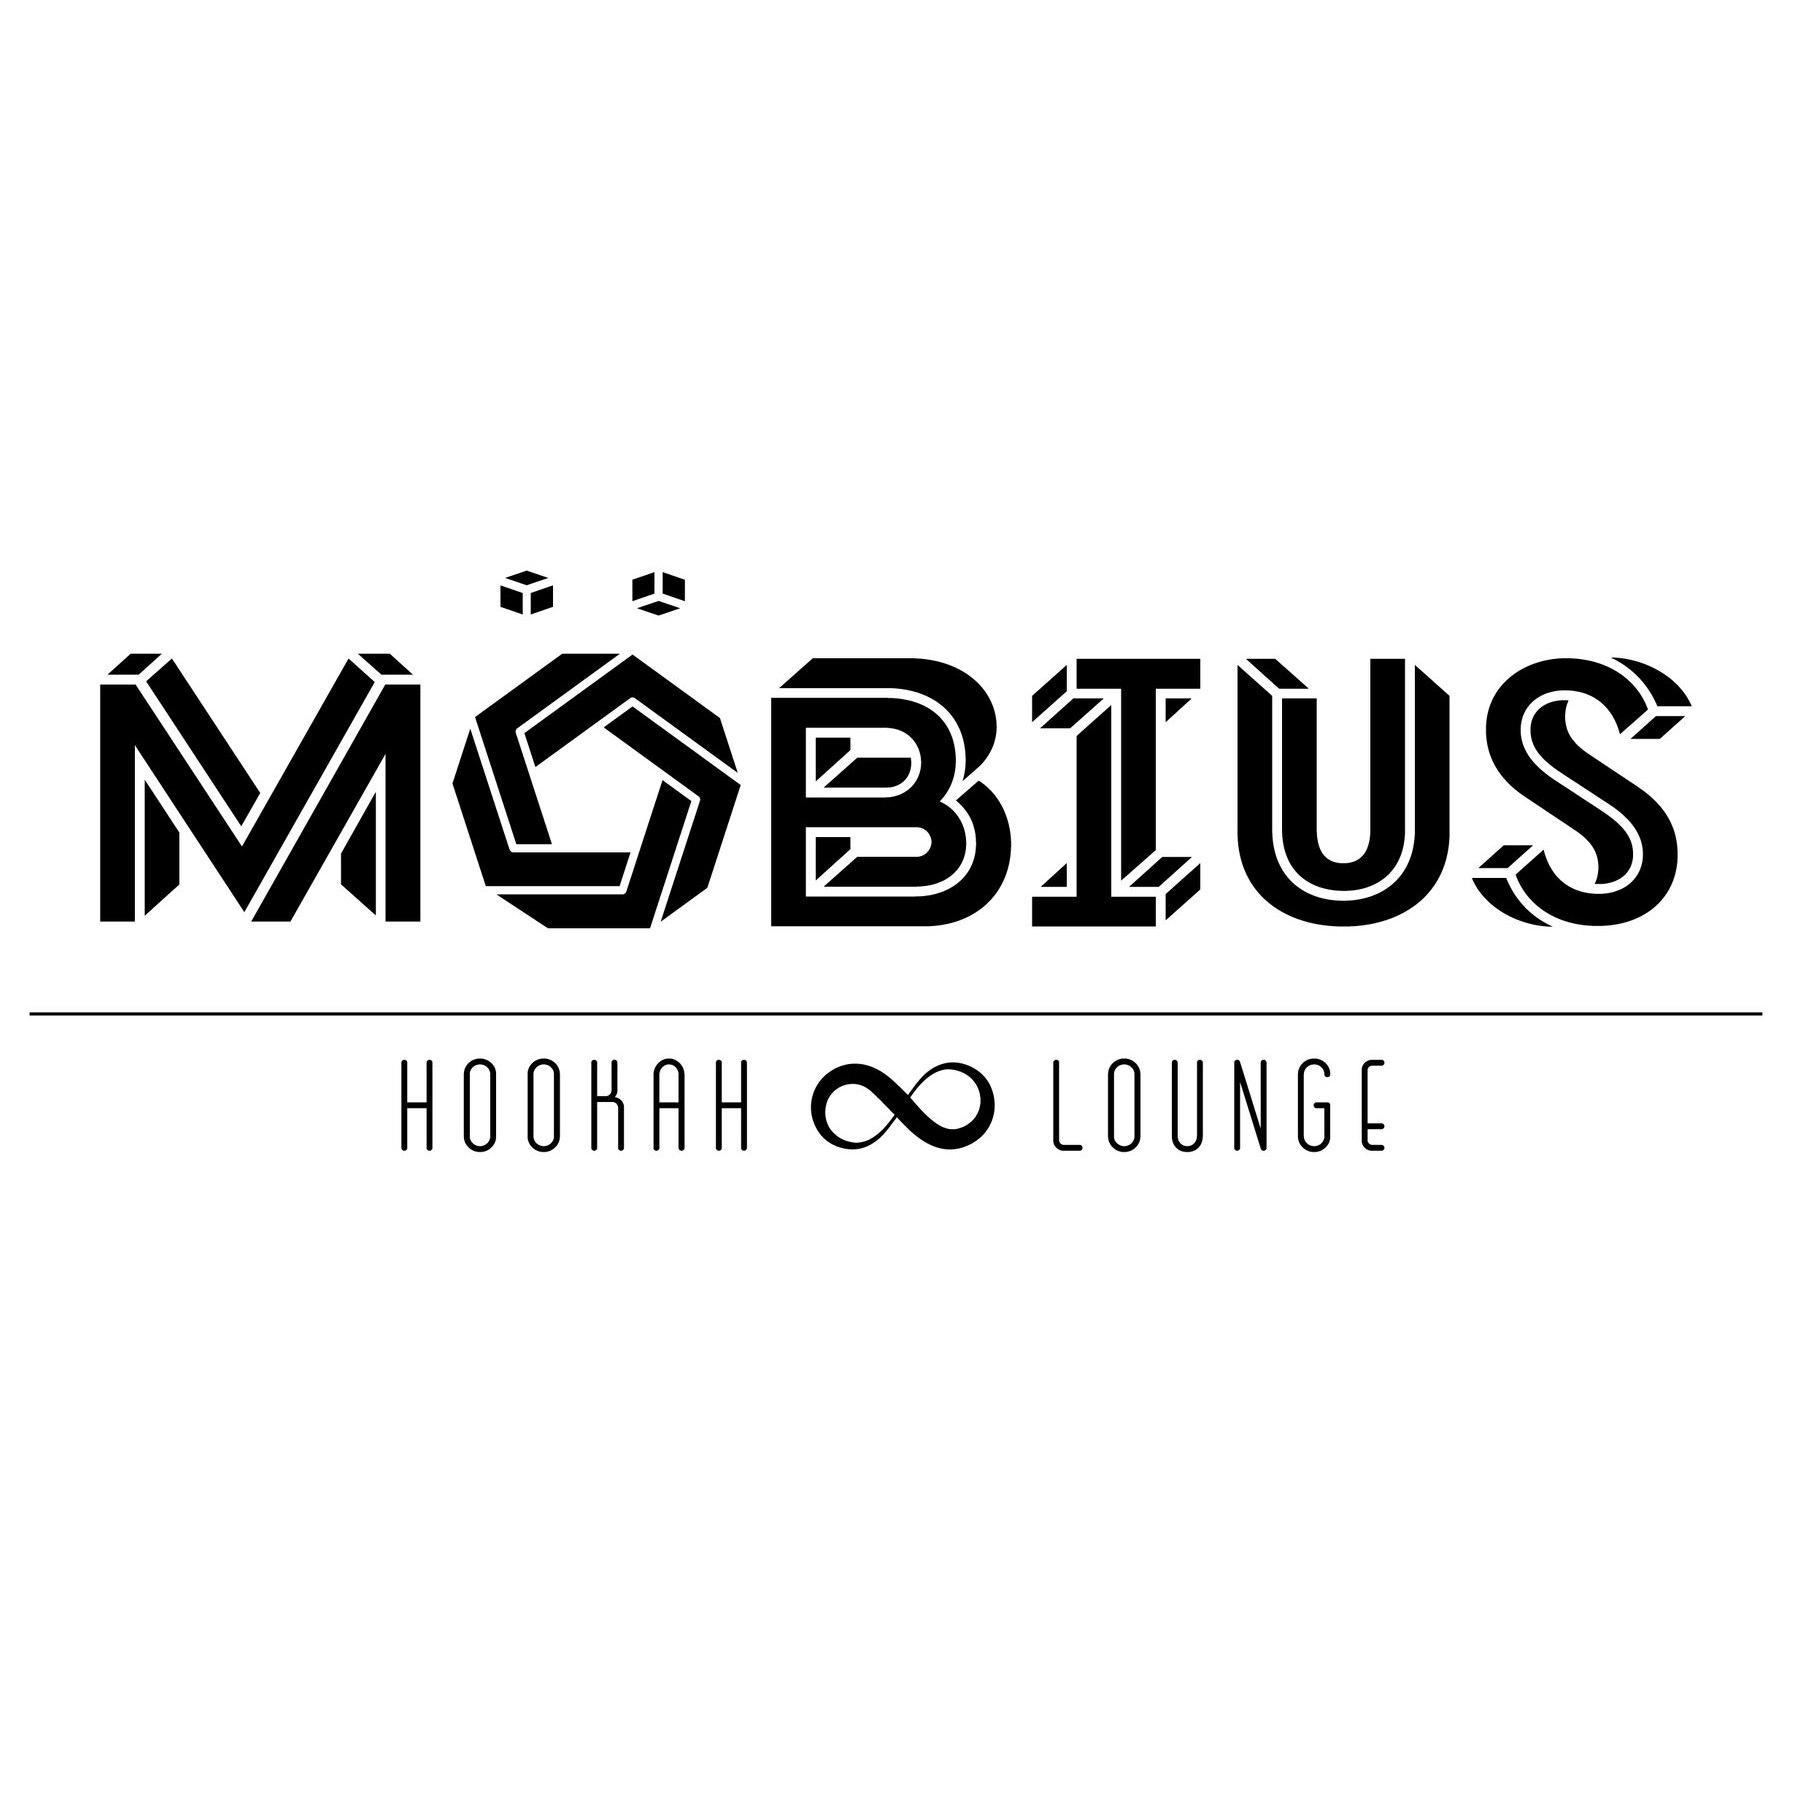 Логотип площадки Mebius Hookah Lounge